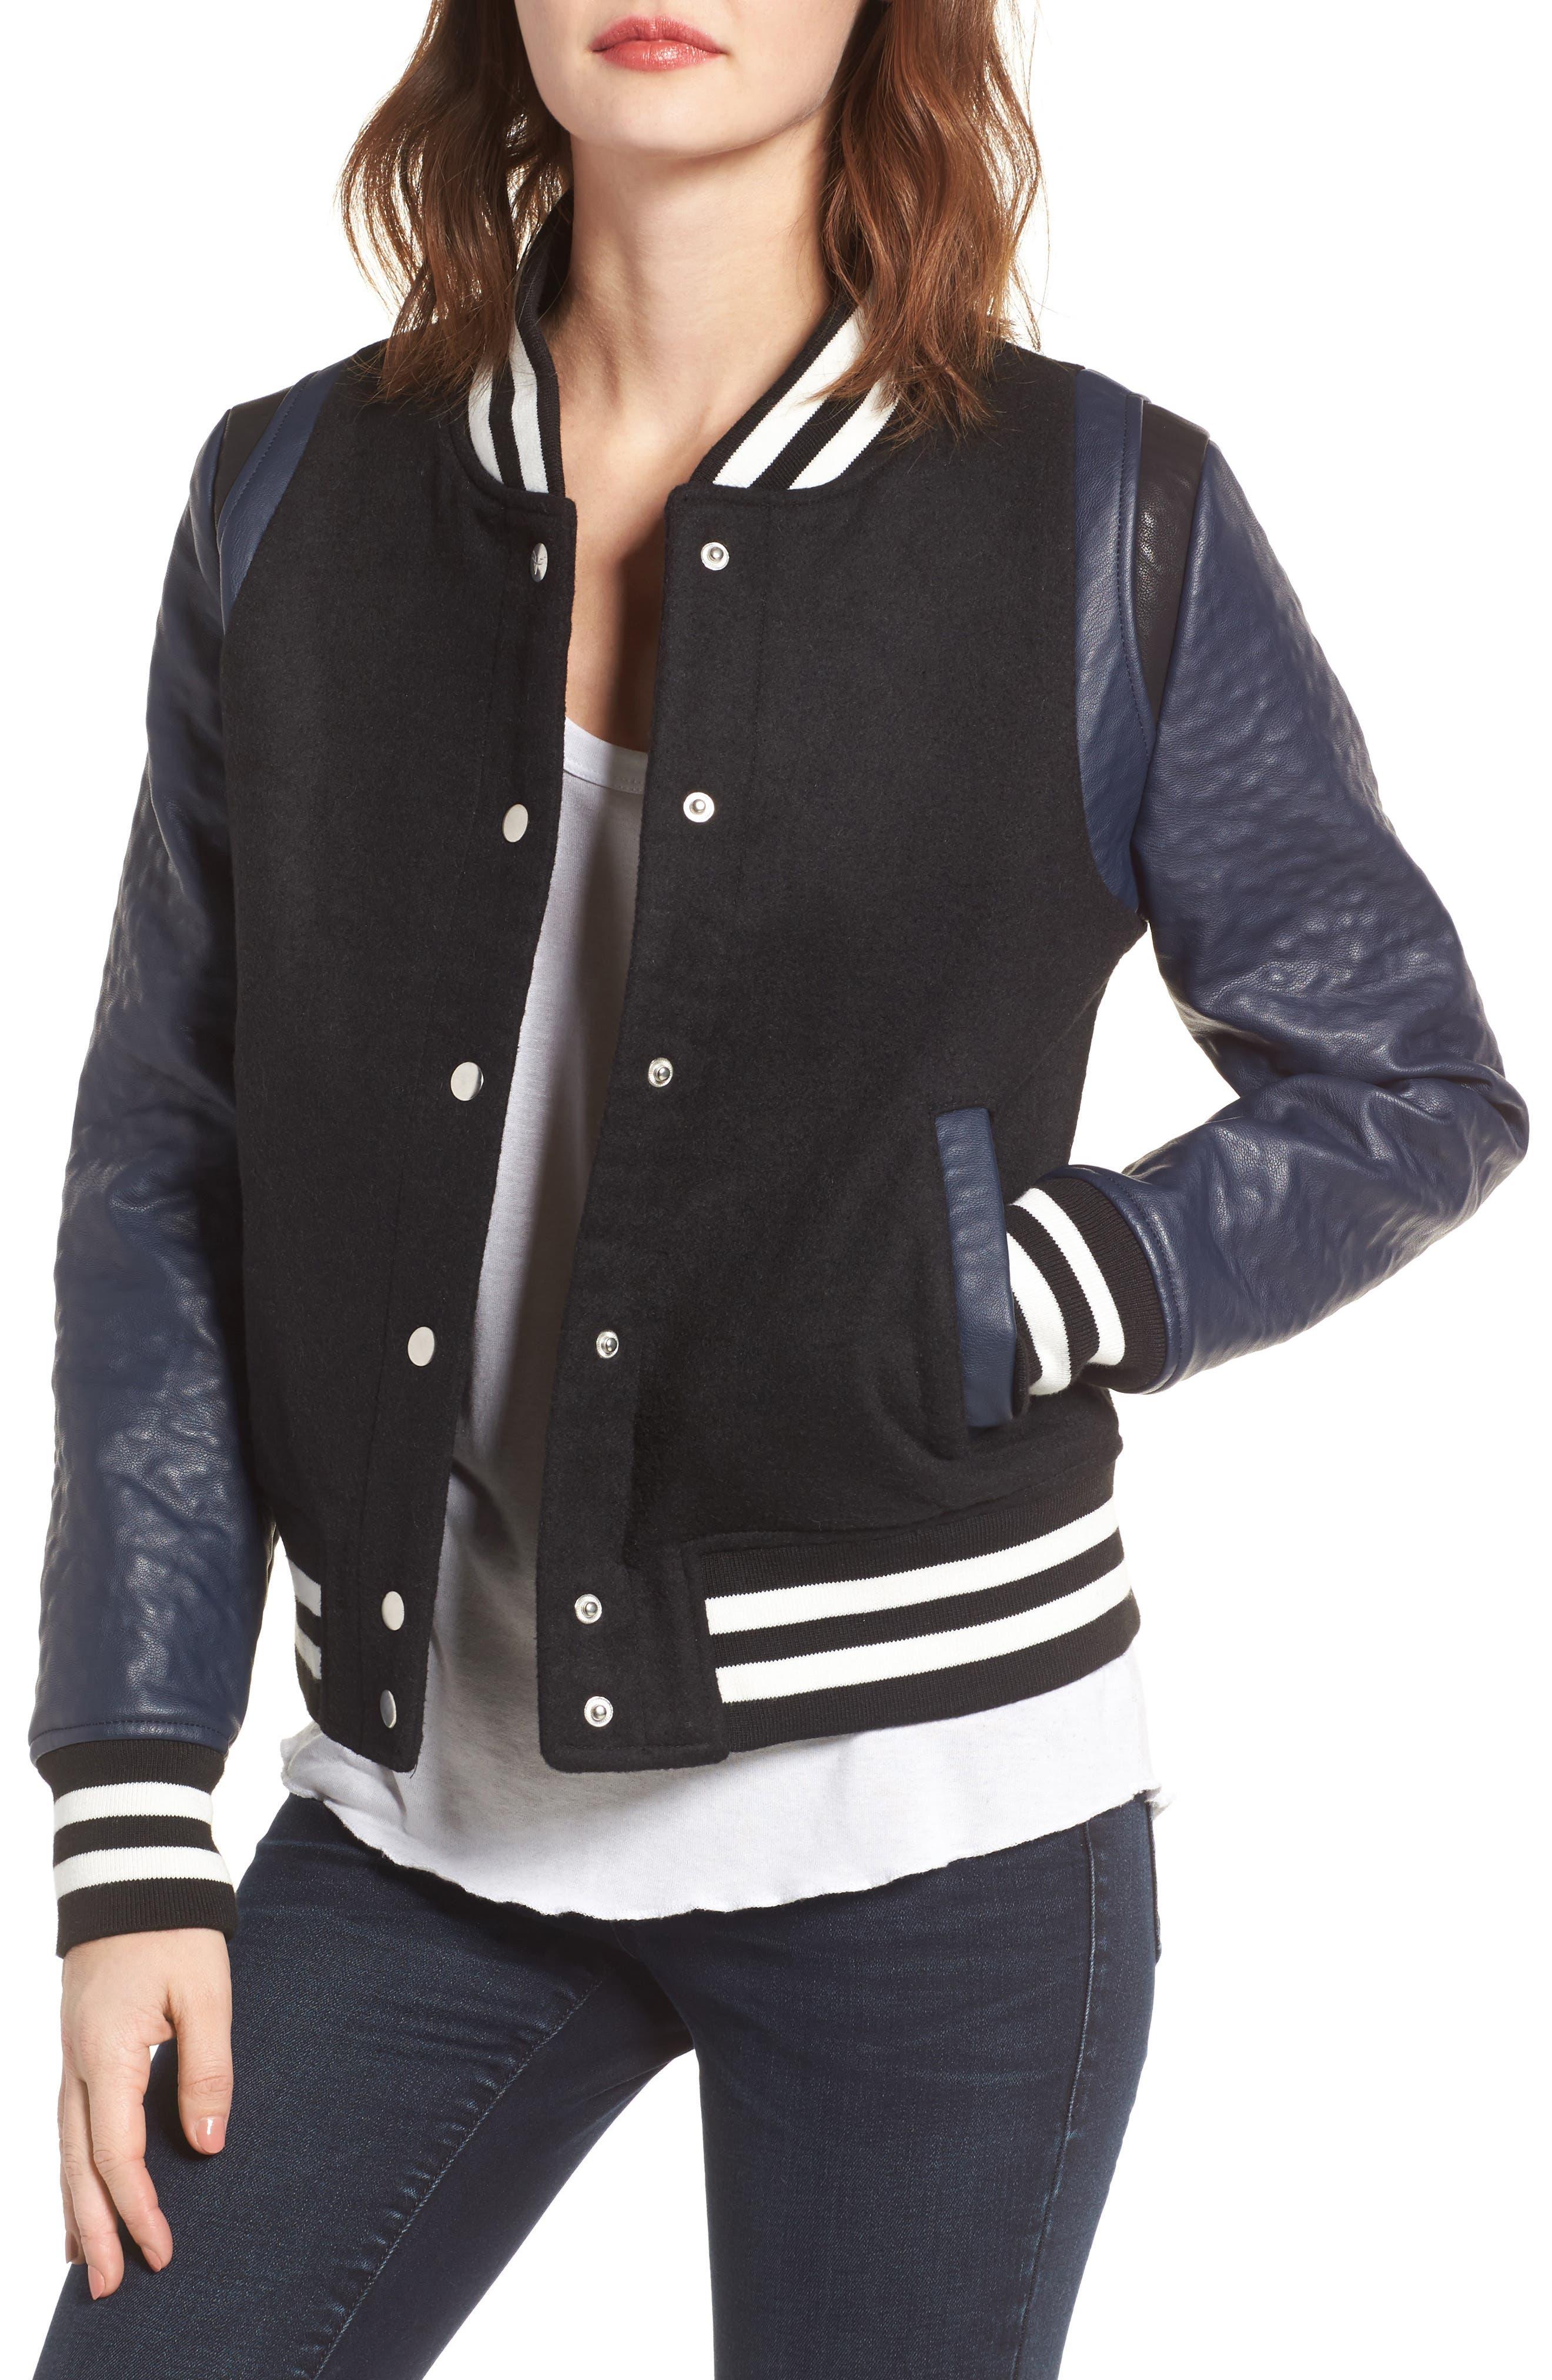 Main Image - Vigoss Wool & Faux Leather Baseball Jacket